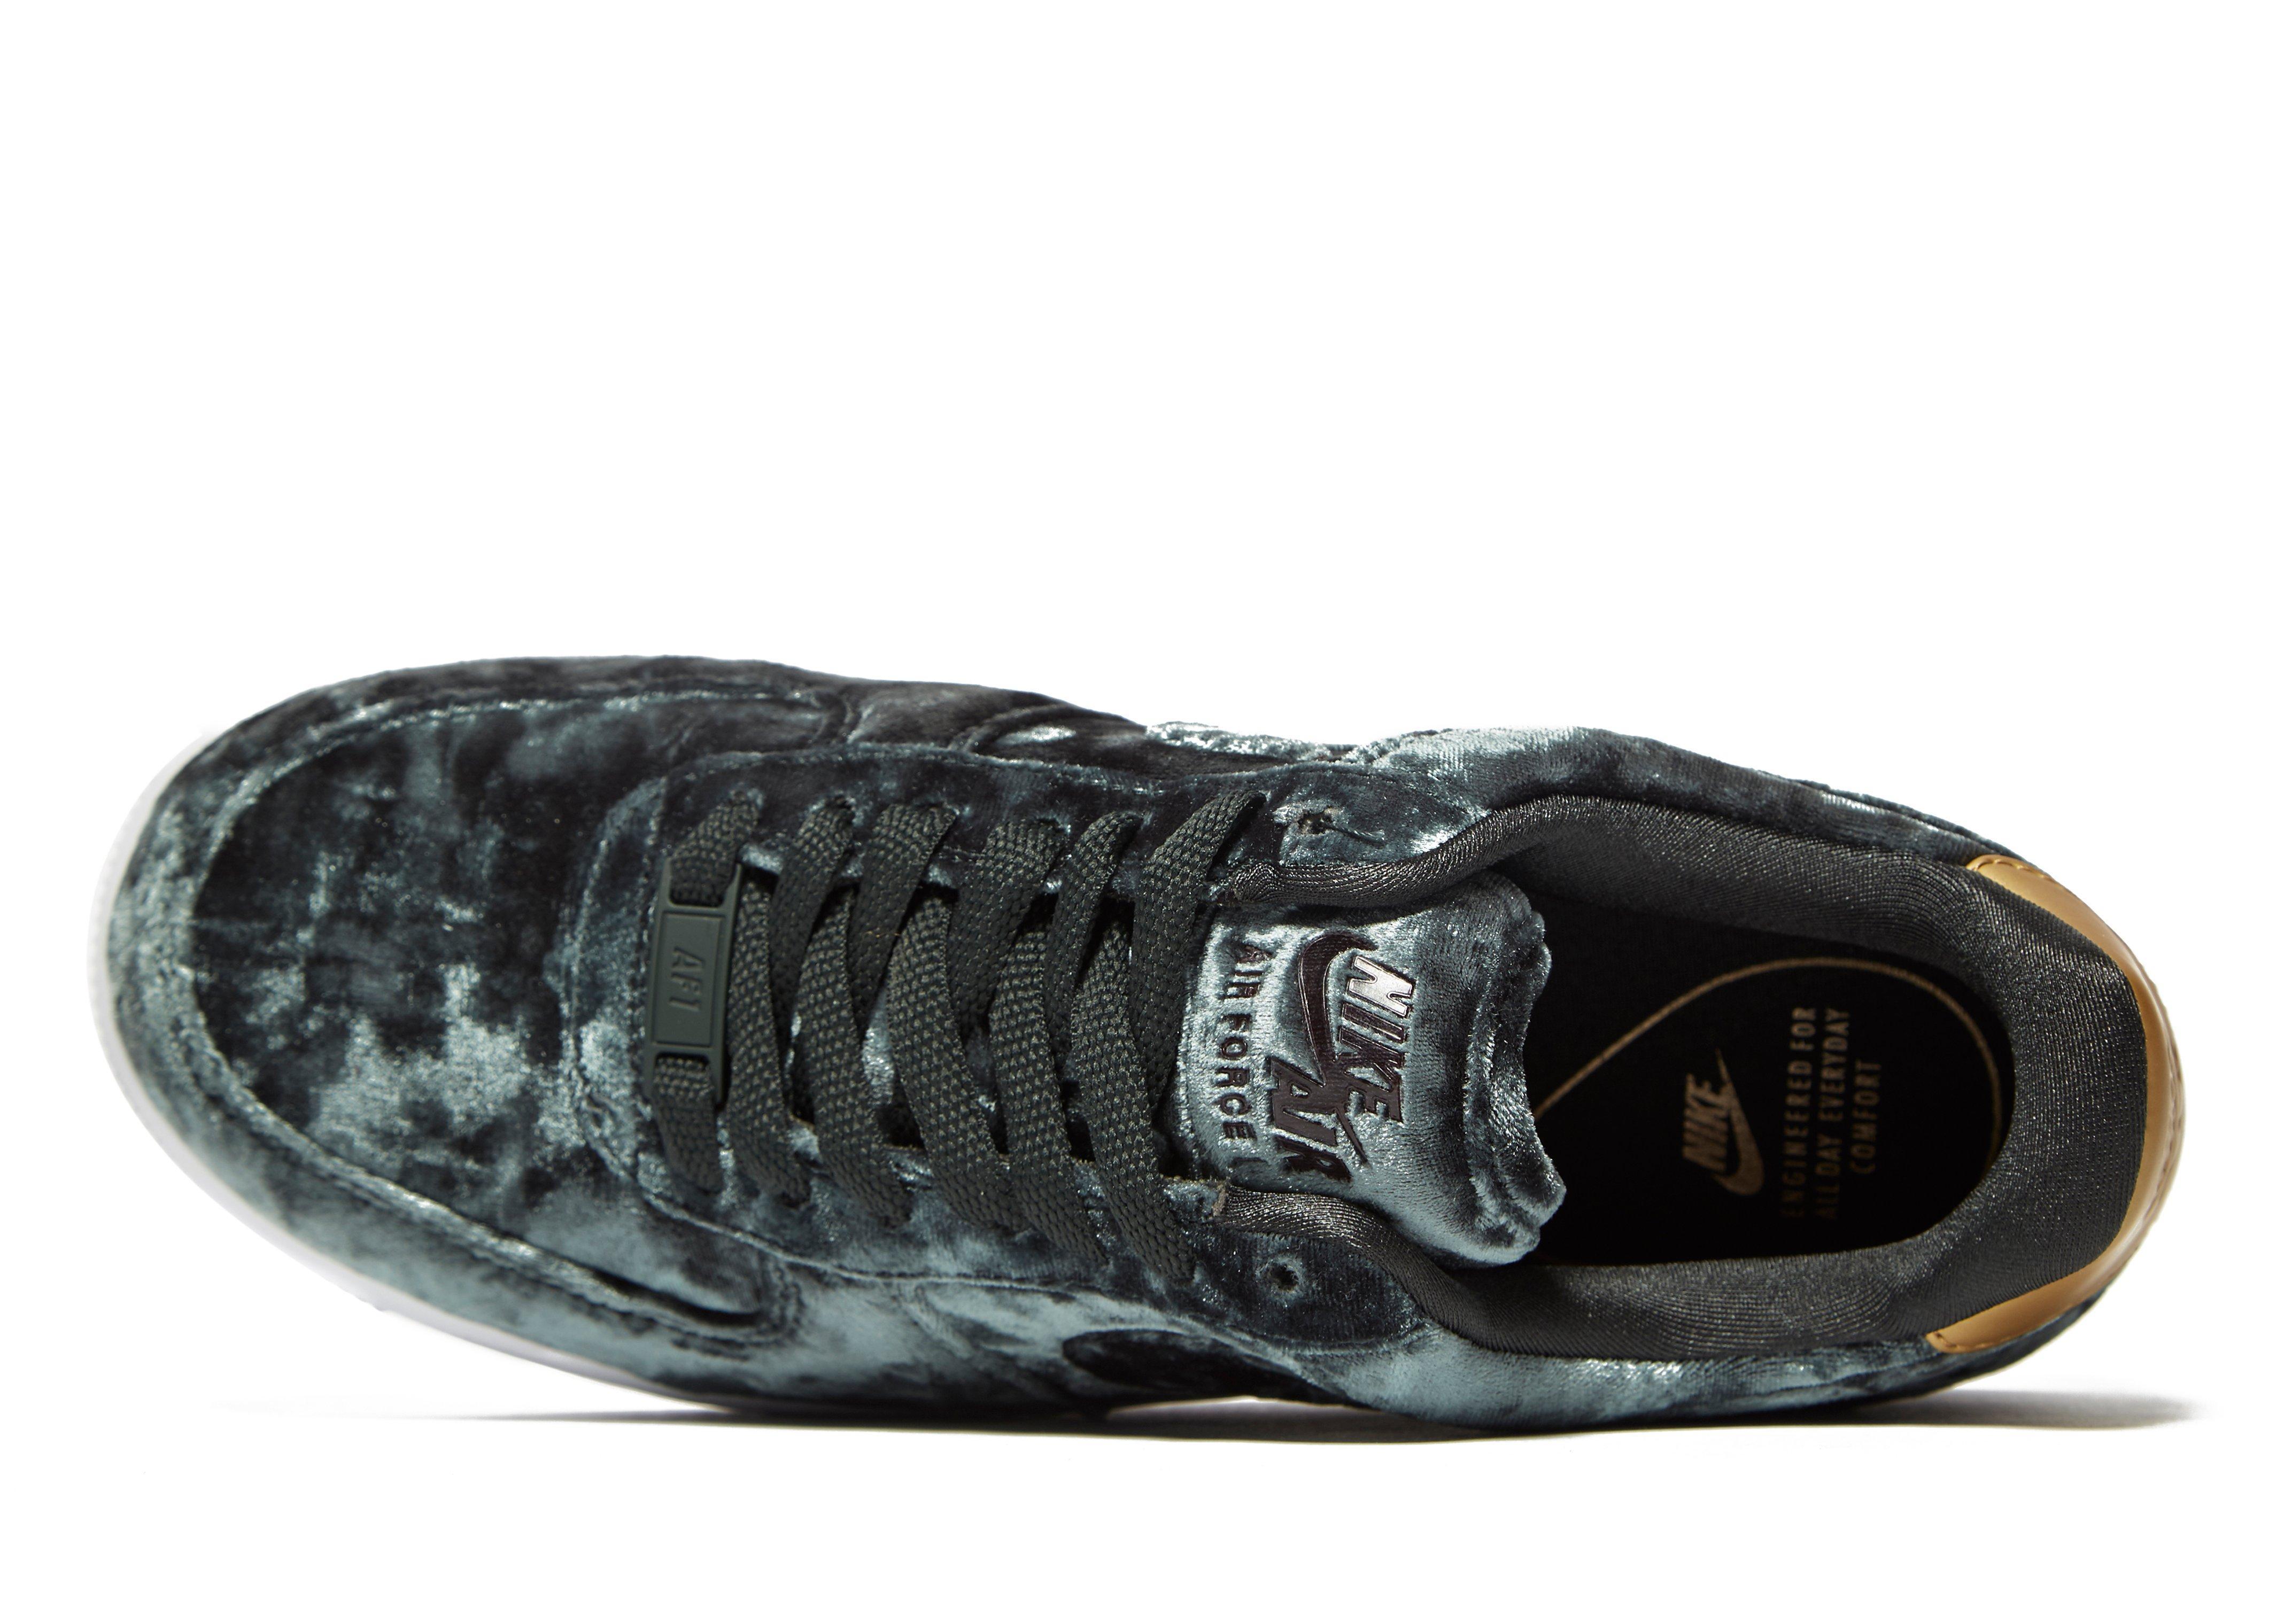 cd14e81d5573e Cheap Nike Air Foamposite Pro Shoe Made In Usa